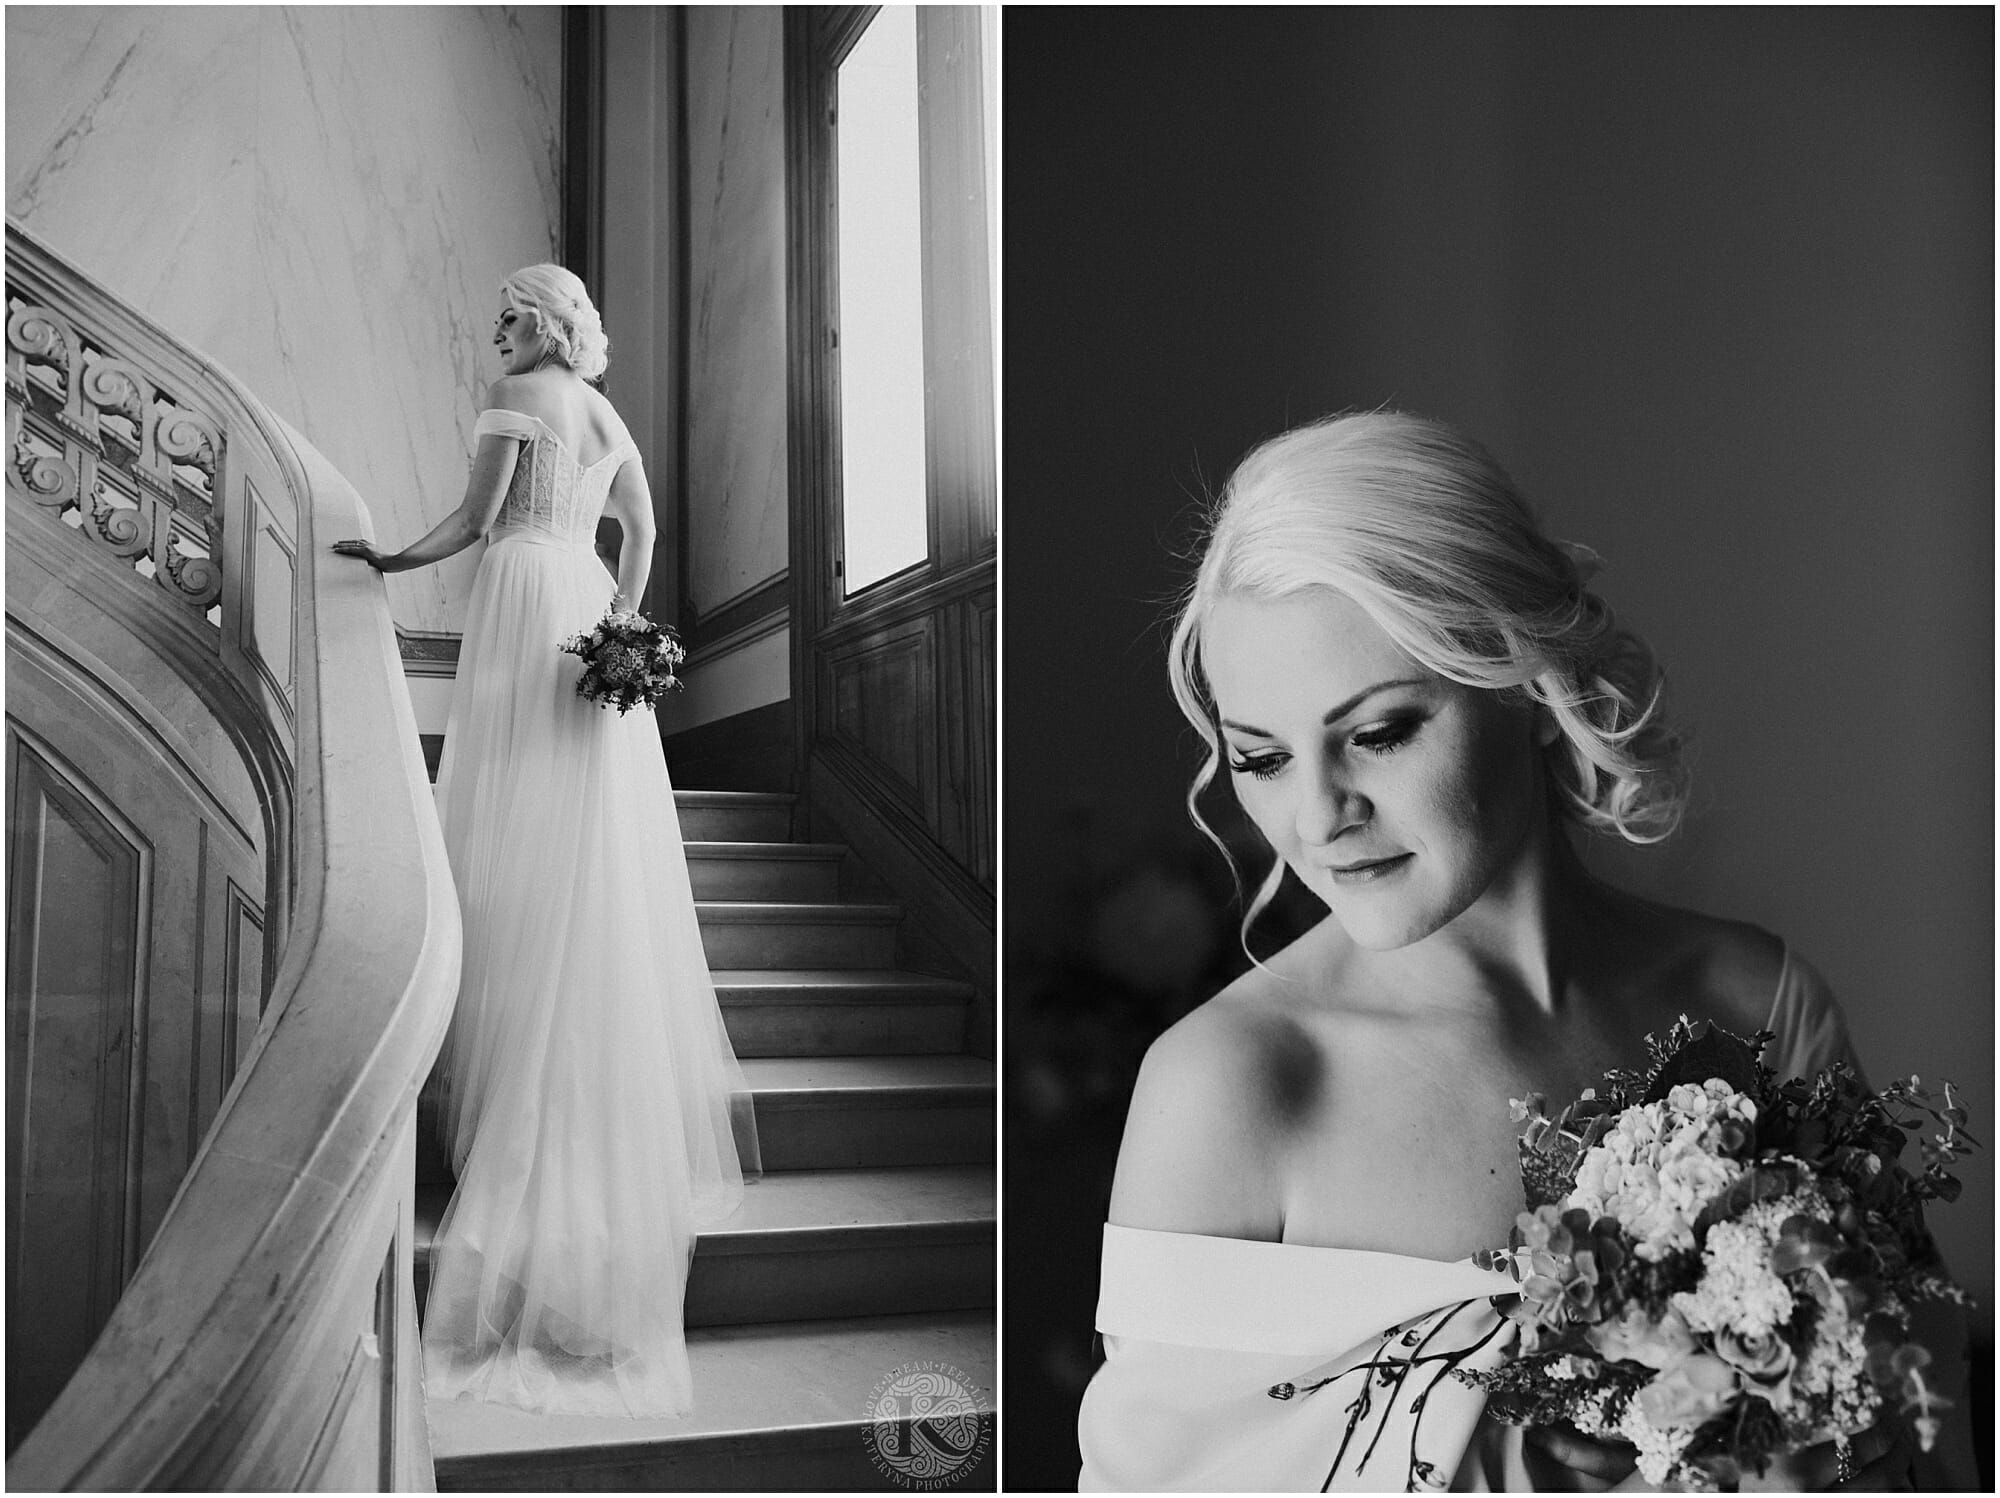 Kateryna-photos-photographe-mariage-chateau-des-3-fontaines-provence-avignon-vaucluse-sud_0034.jpg